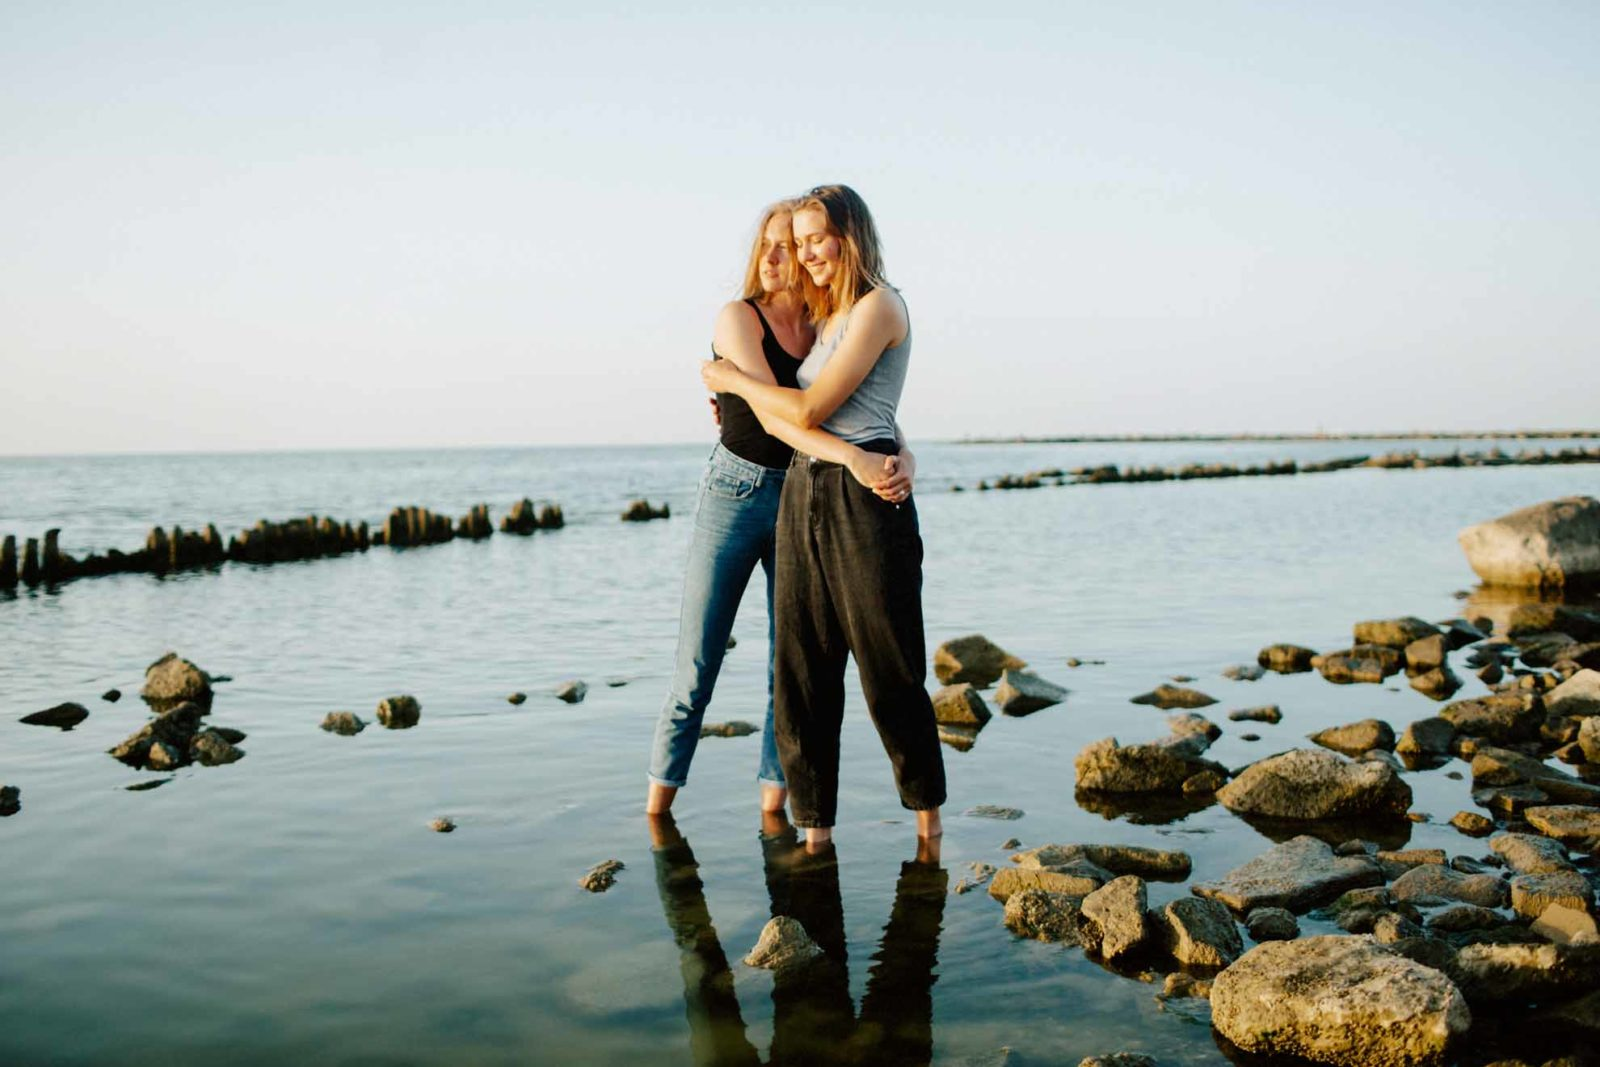 Darya Elfutina Photography lesbian same-sex lgbt+ Moscow Russia Europe love Dancing With Her magazine